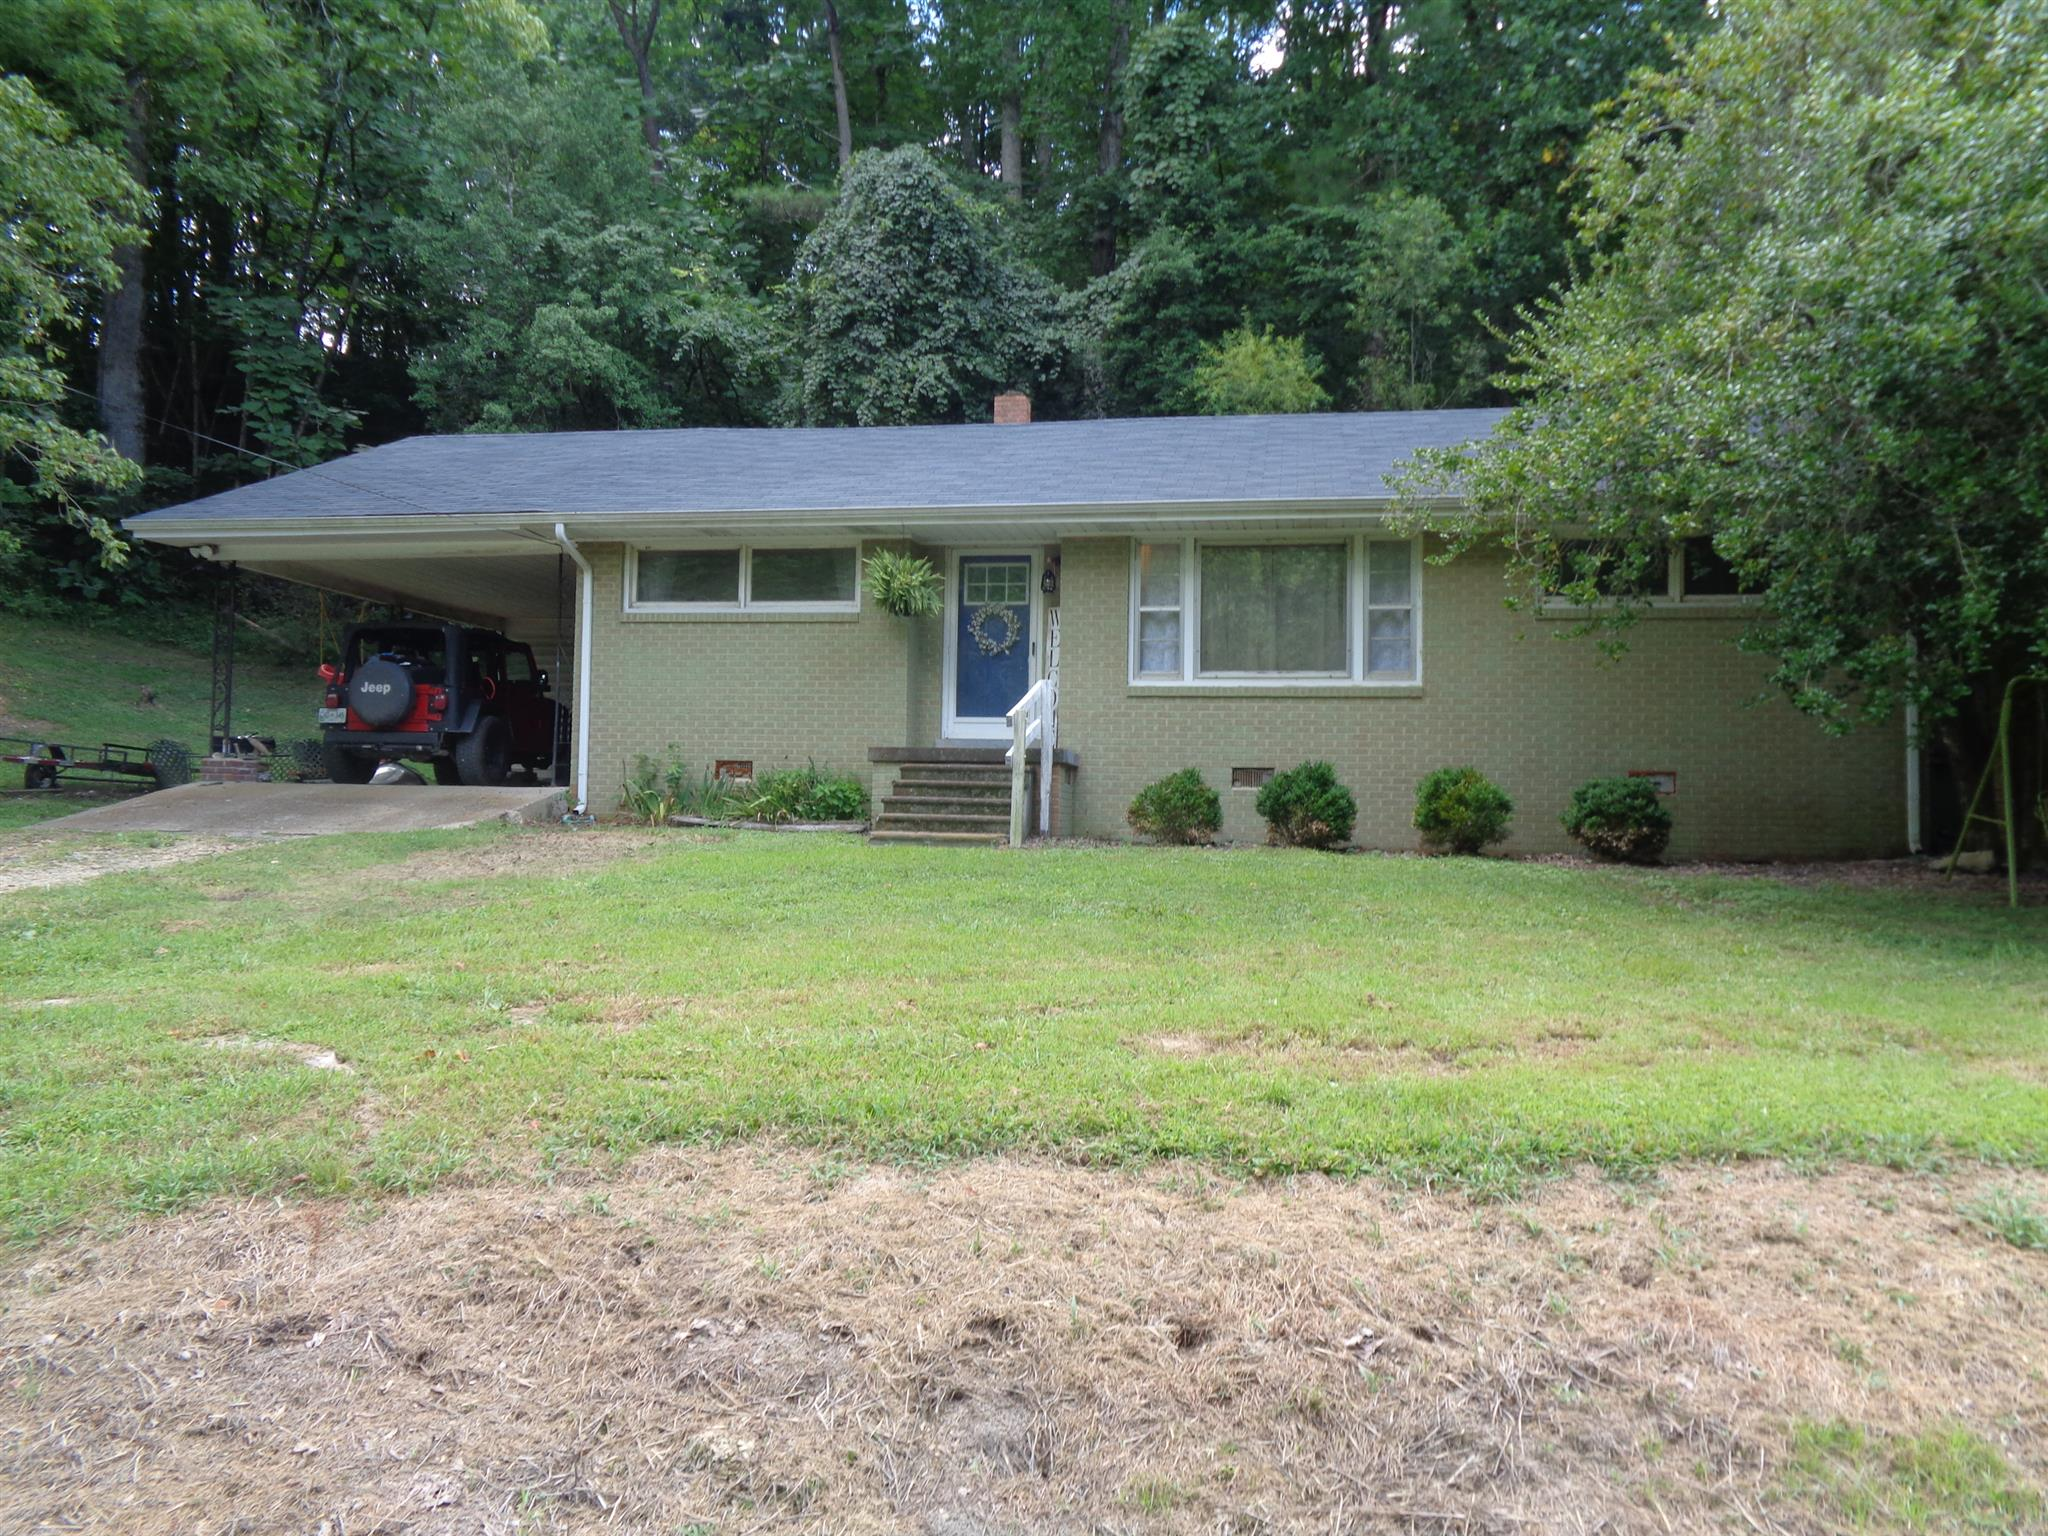 70 Nelson Rd, Lawrenceburg, TN 38464 - Lawrenceburg, TN real estate listing